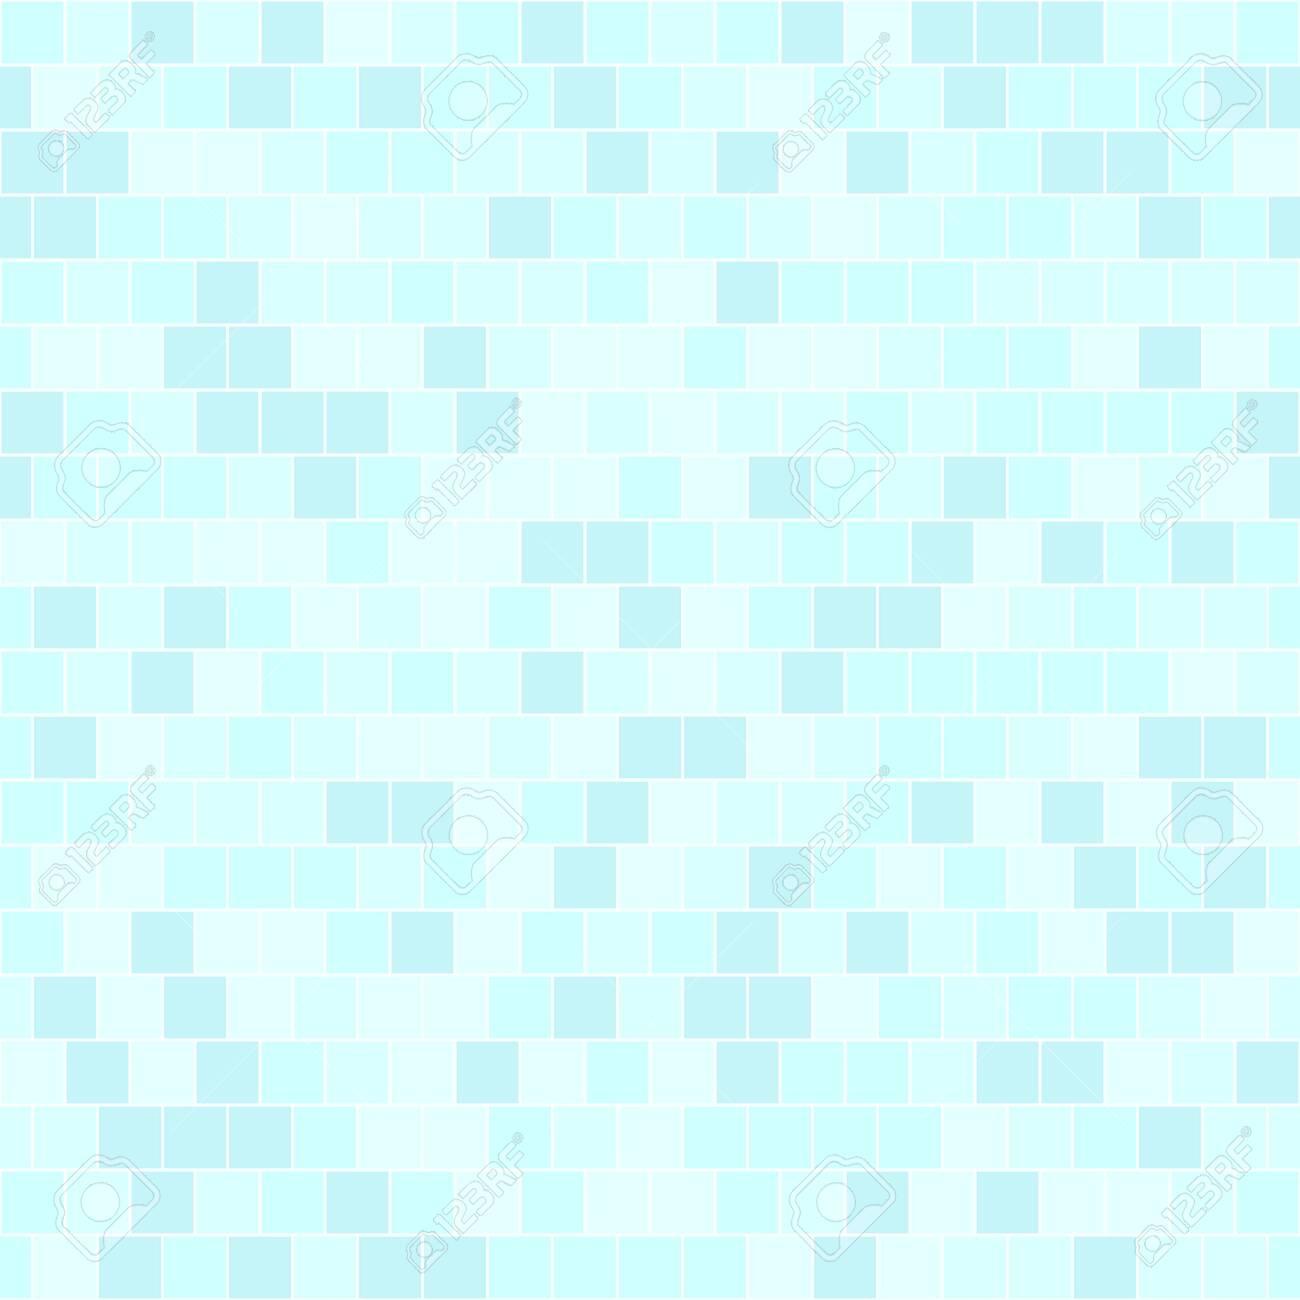 Cyan square pattern. Seamless vector background - blue quadratic bricks on light cyan backdrop - 134498671